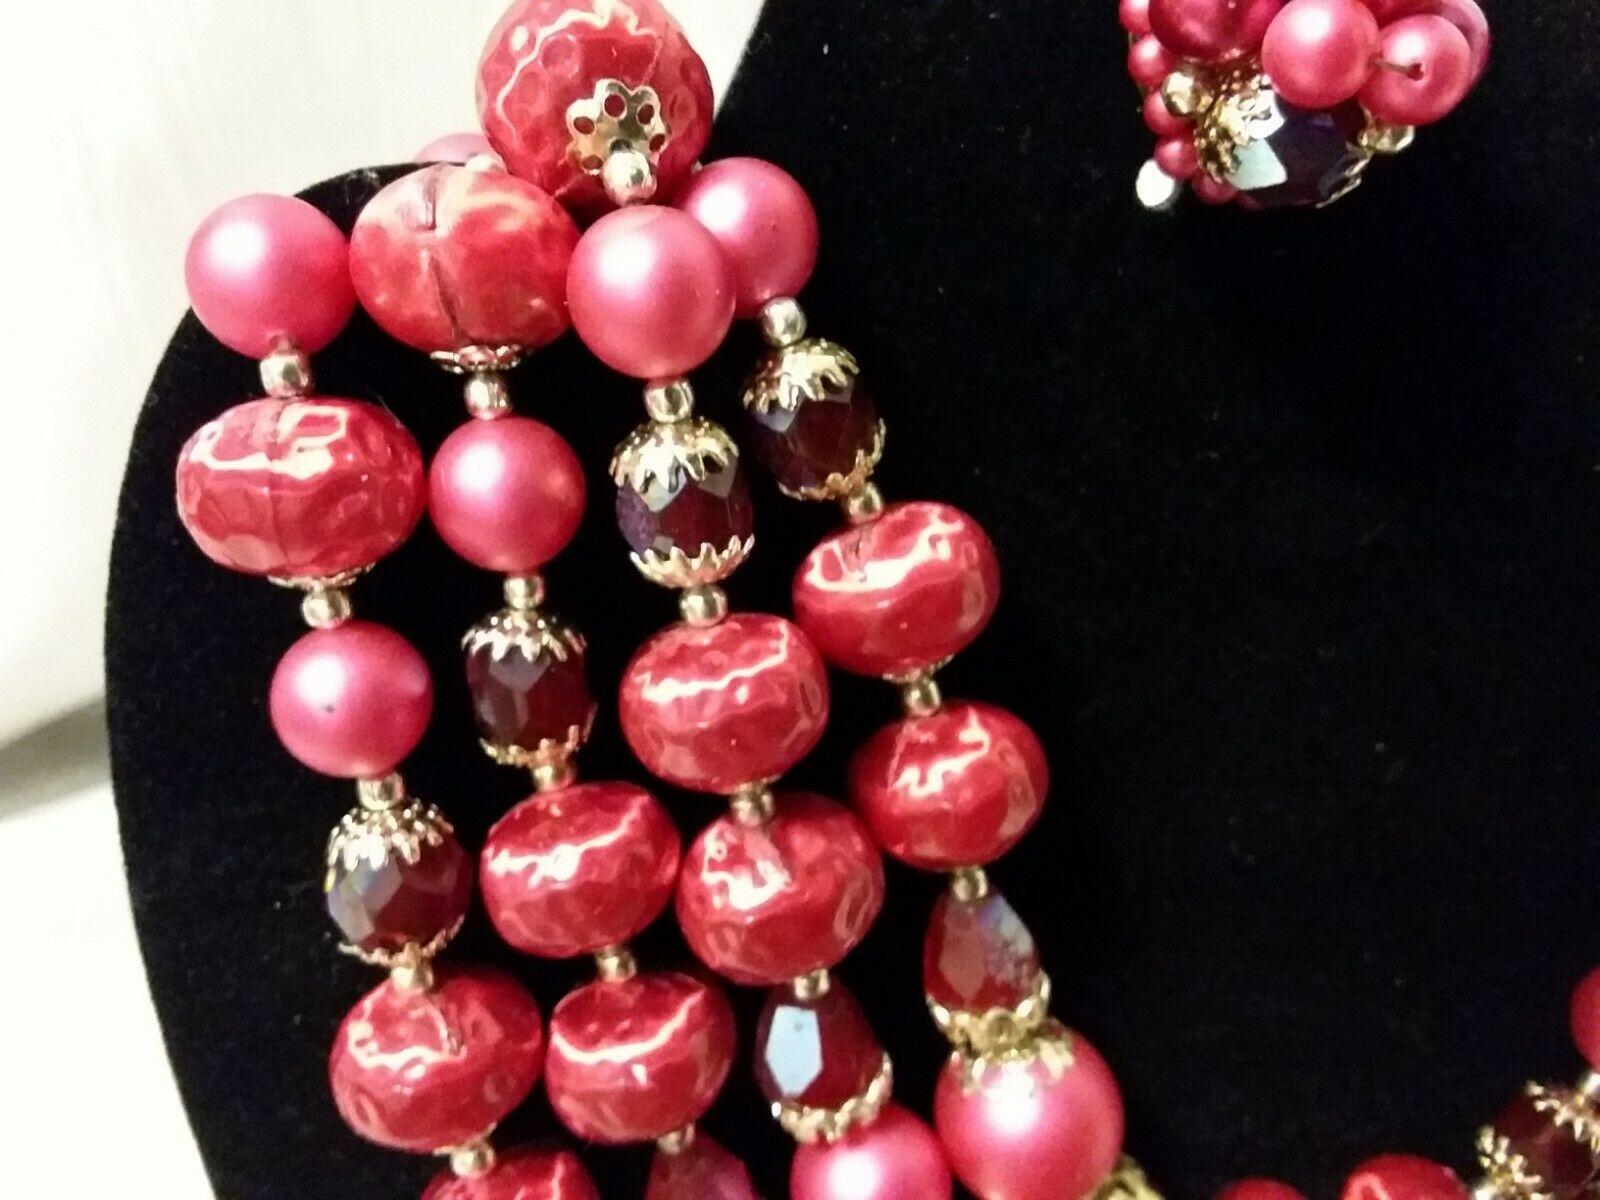 Vintage MadMen 4 Strand Graduated Glass? Bead Bib Necklace & Clip Earrings Japan